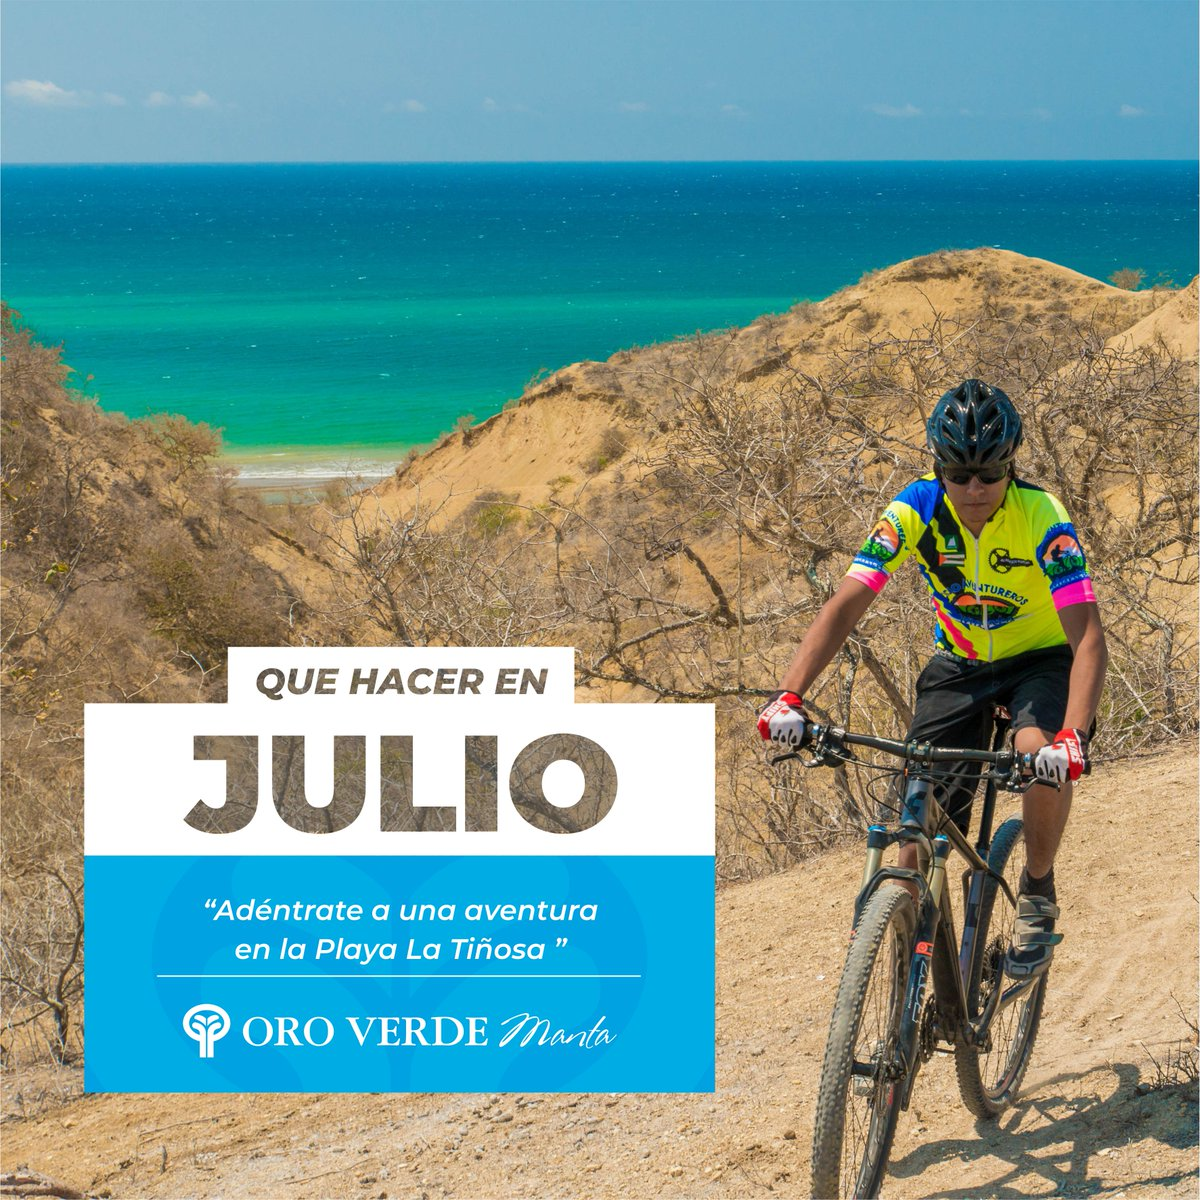 Que hacer en Julio! 🌊🏖😎 #Oroverdemanta #Deluxe #Beach #Manta https://t.co/g3CXoRt0ZQ